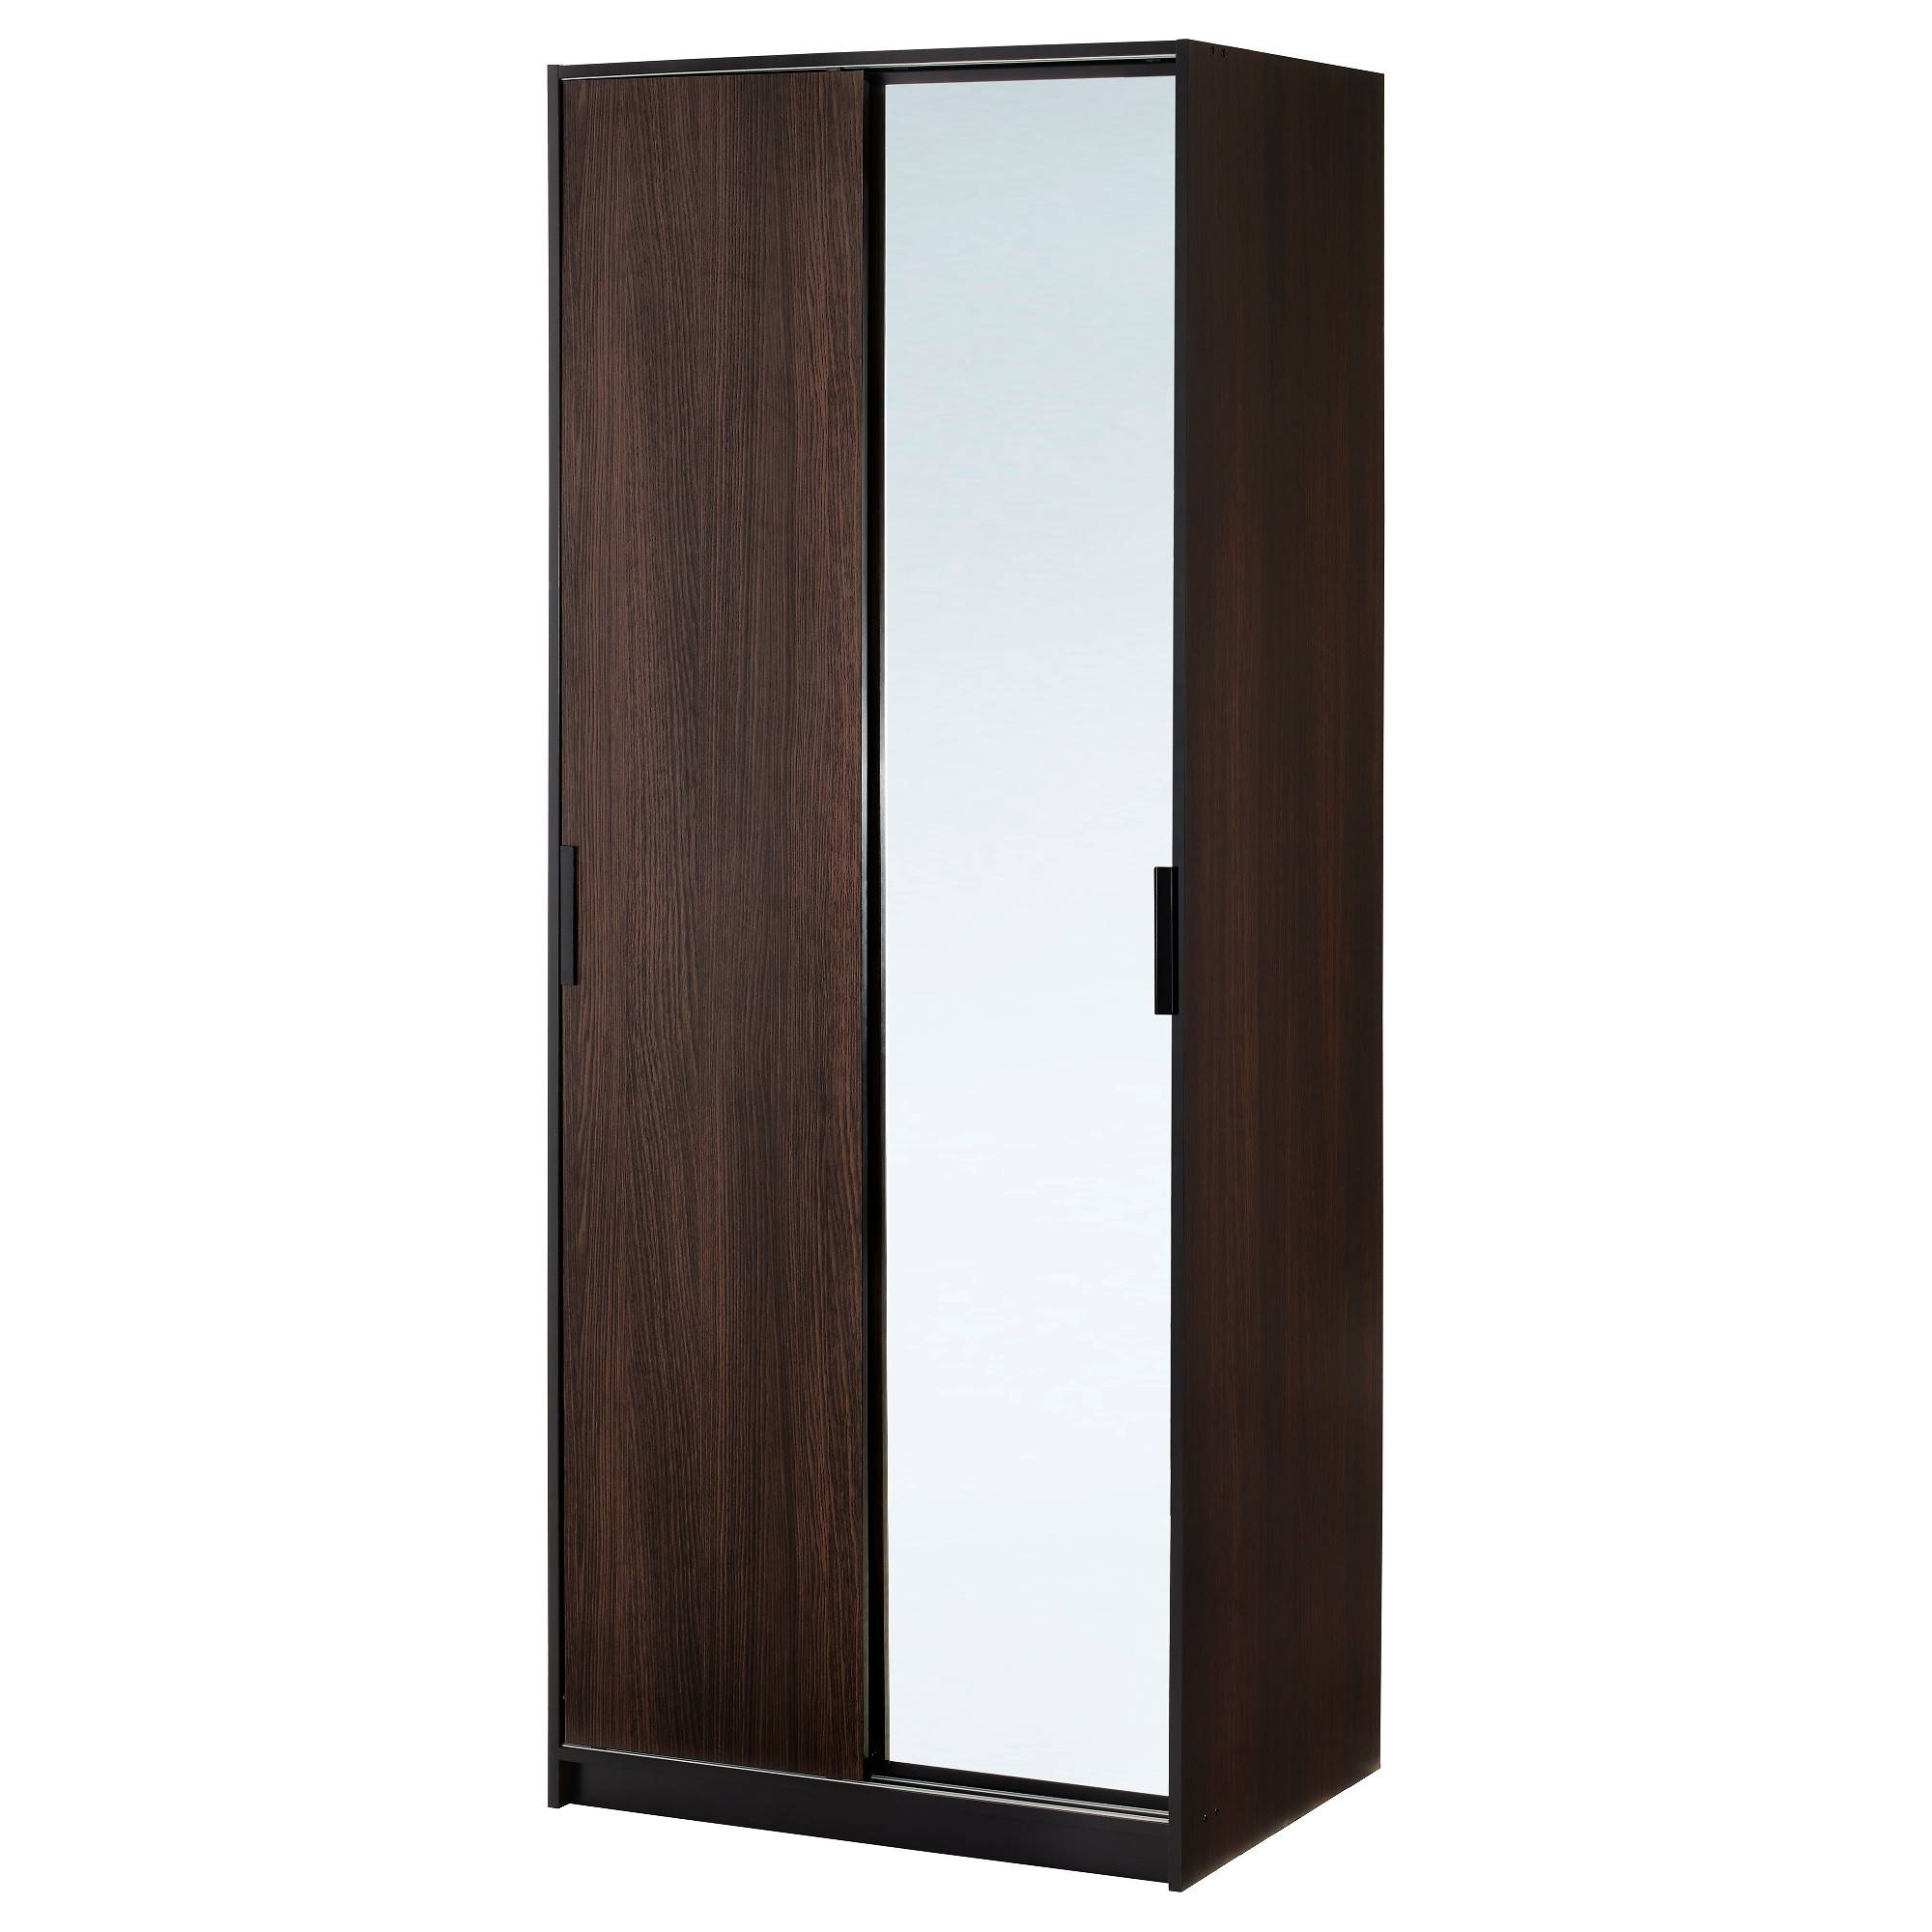 Trysil Wardrobe W Sliding Doors/4 Drawers Dark Brown 118X61X202 Cm in Dark Wardrobes (Image 23 of 30)